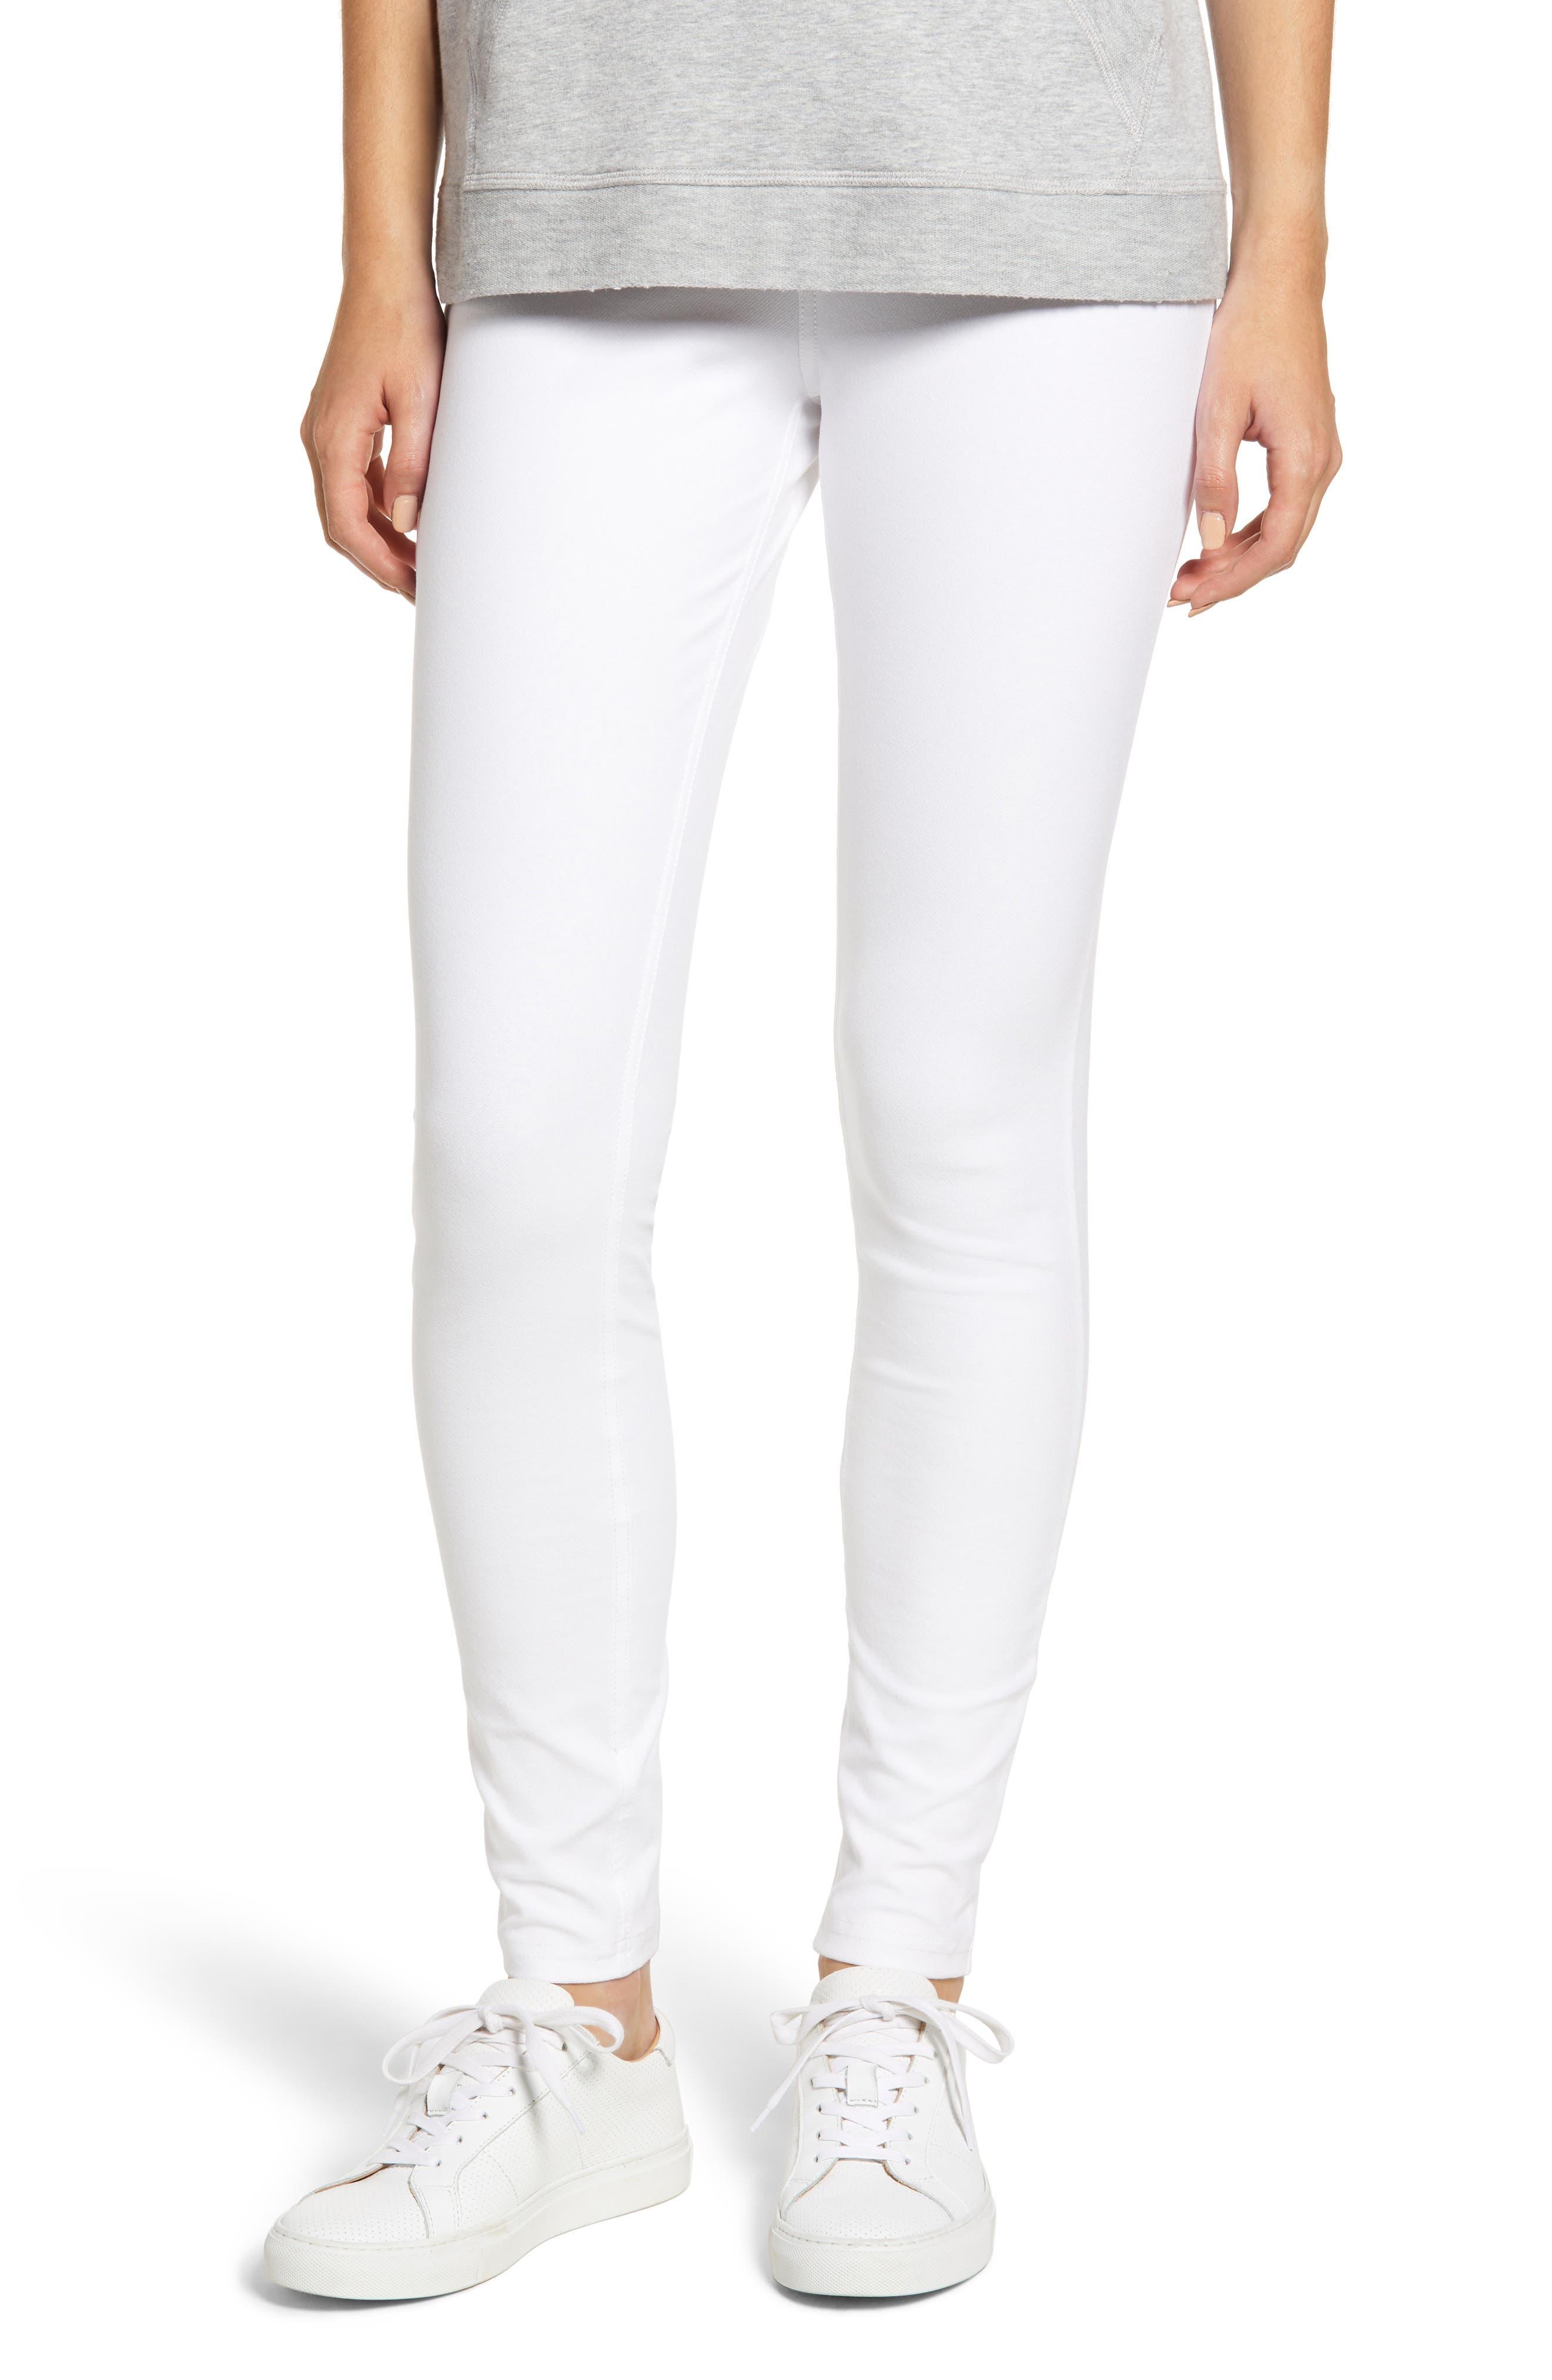 Denim Leggings,                         Main,                         color, White